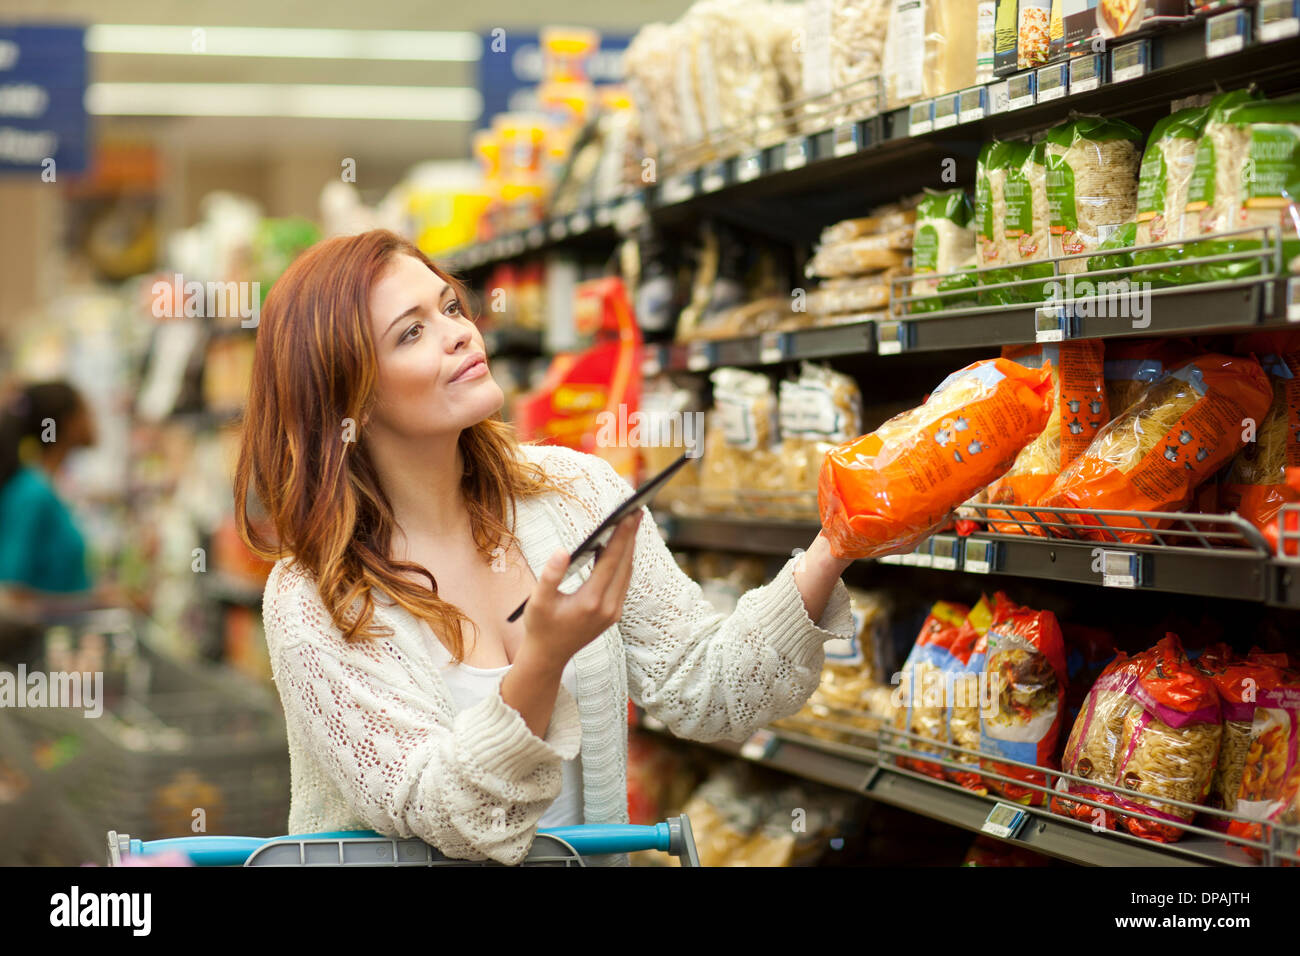 Female shopper with digital tablet in supermarket - Stock Image